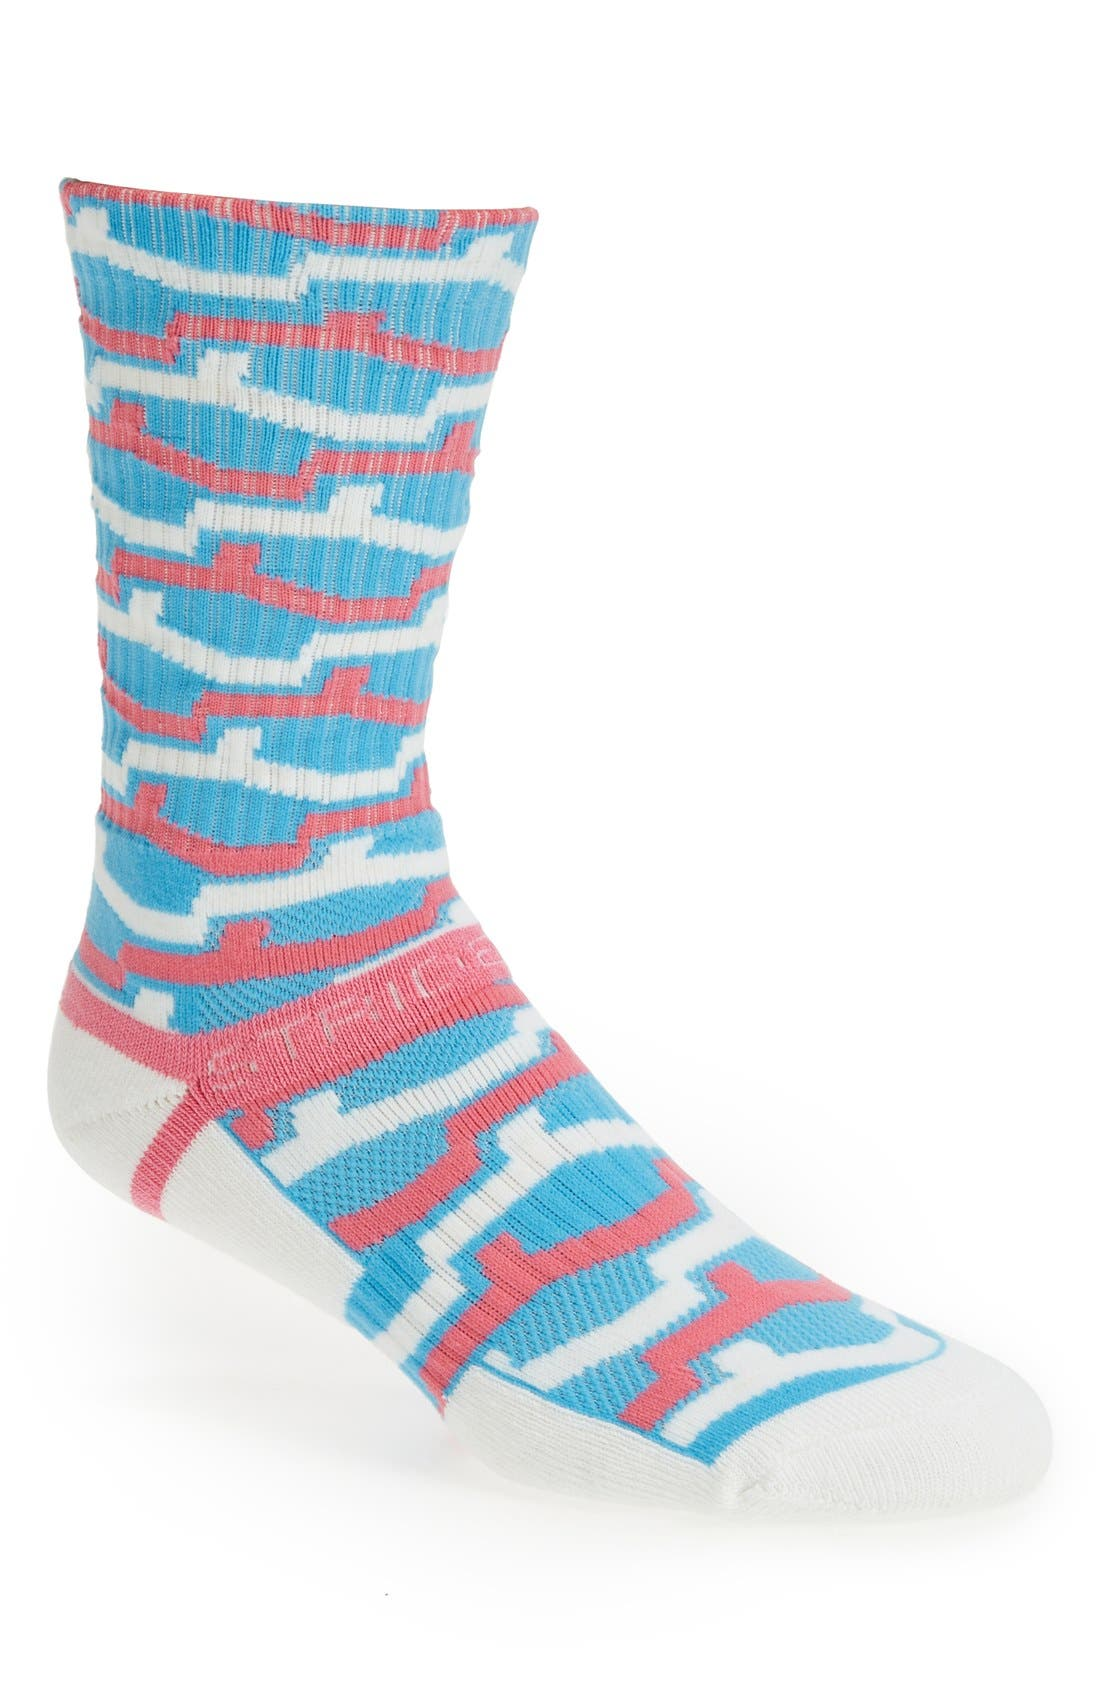 Alternate Image 1 Selected - STRIDELINE 'S Series - Hex' Socks